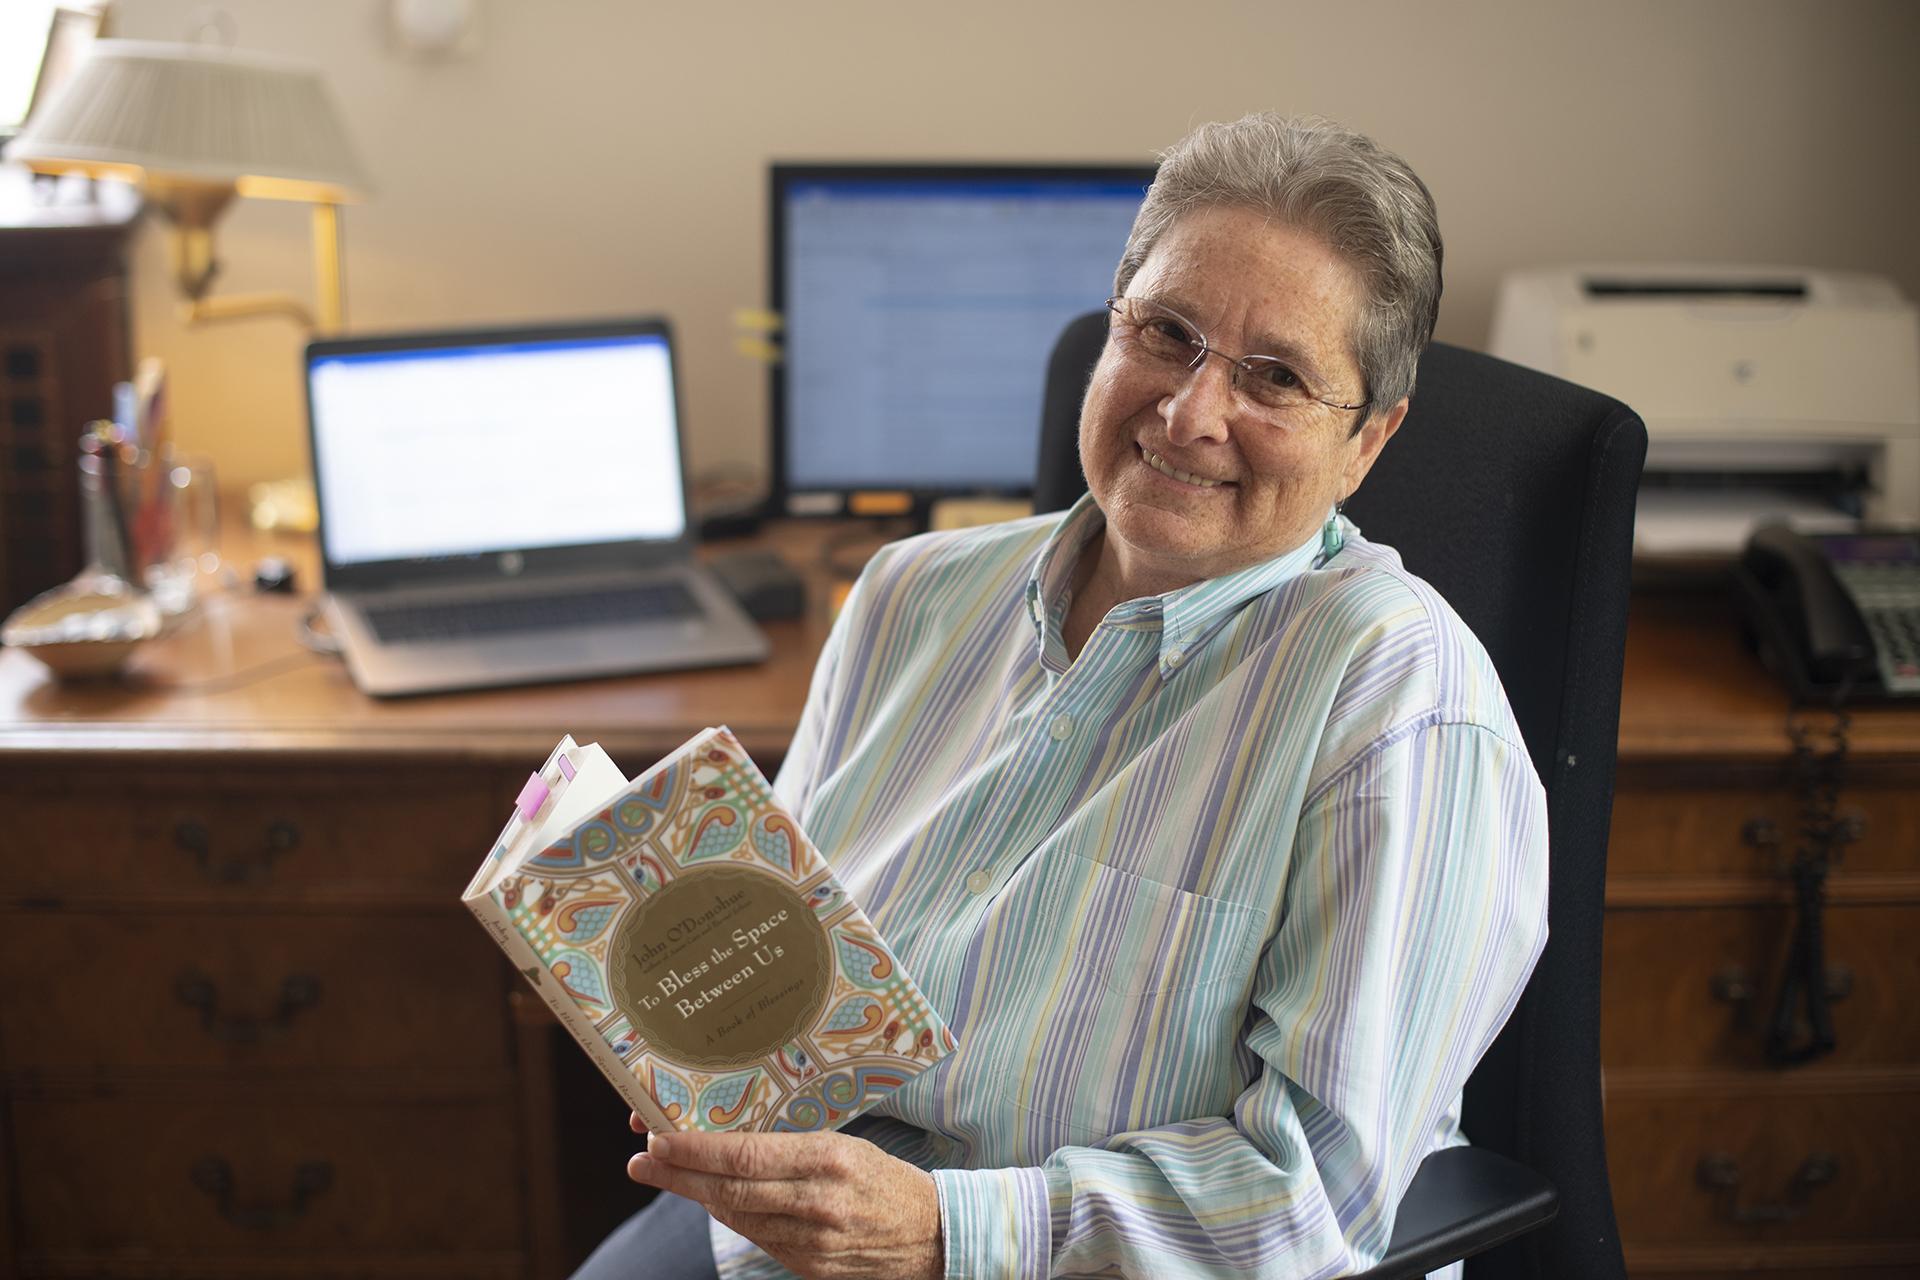 The Rev. Kathleen Buckley